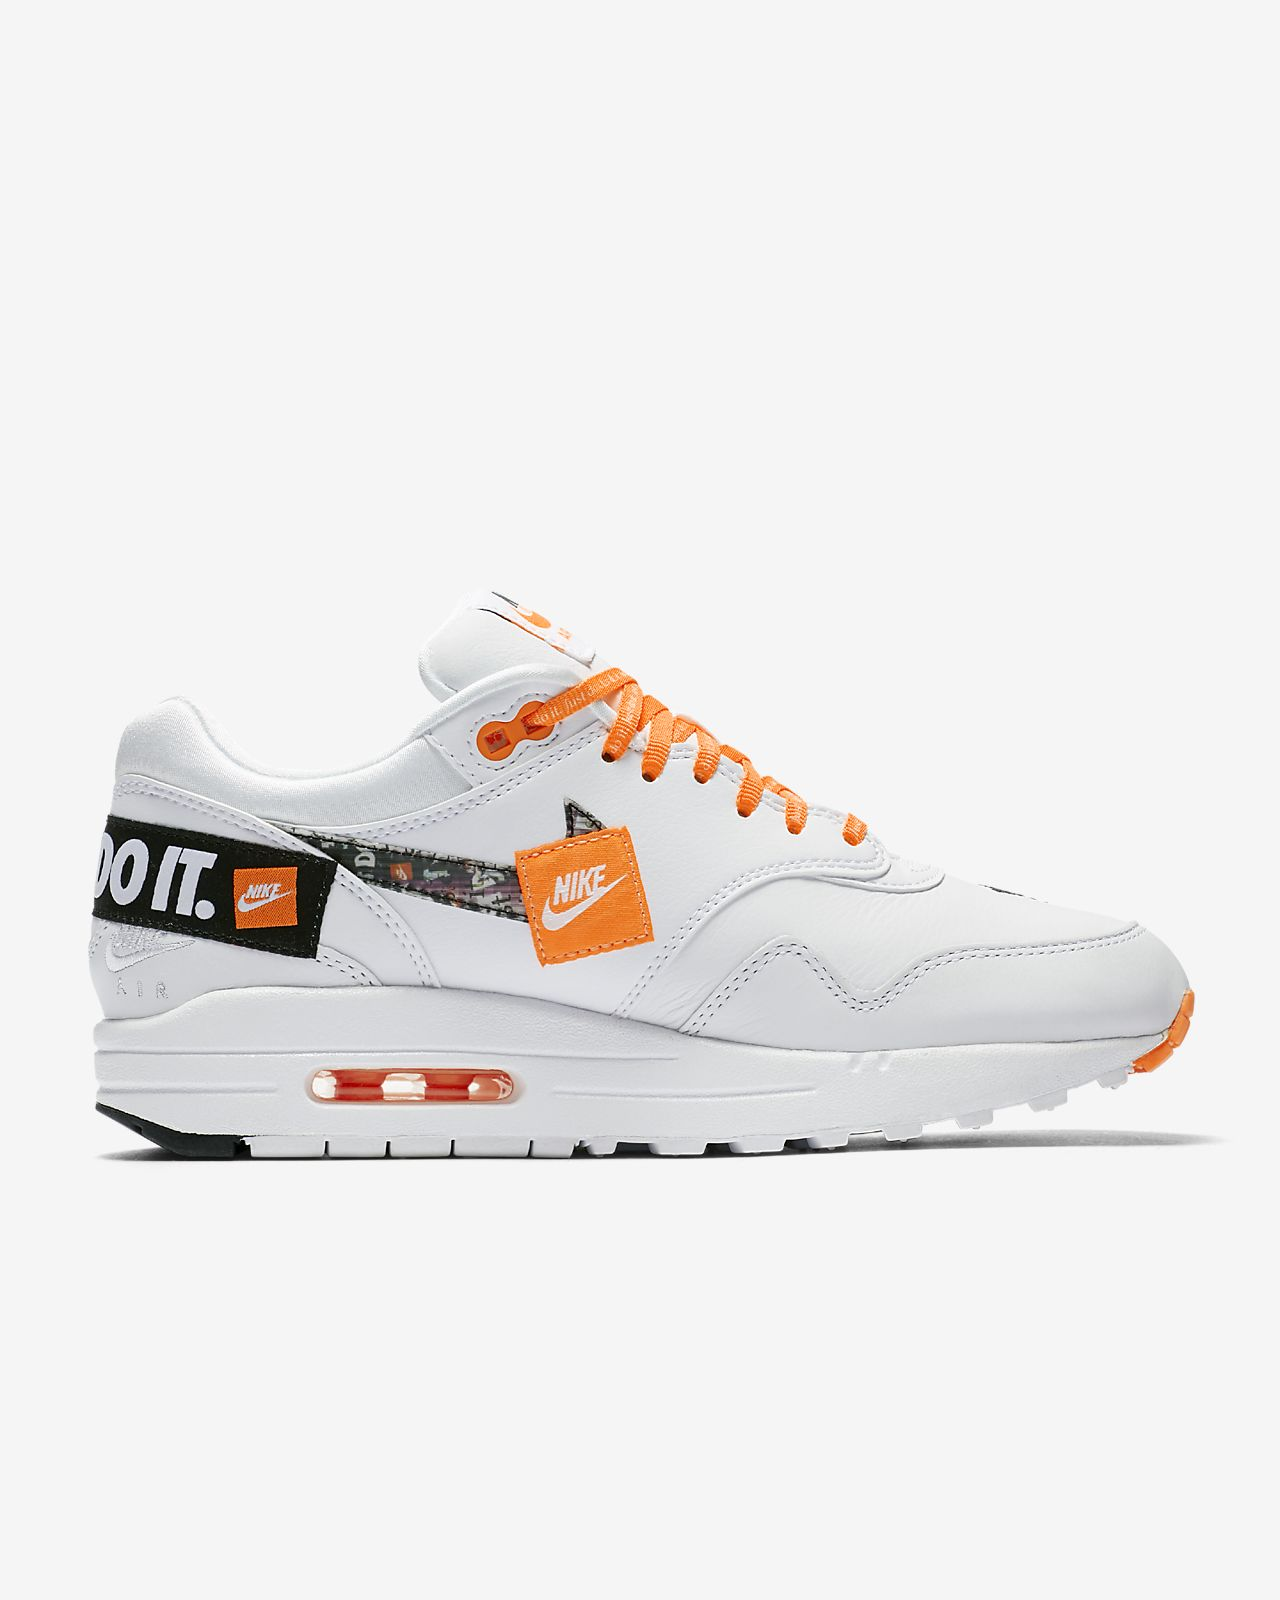 Nike Air Max 1 Lx Womens Style : 917691